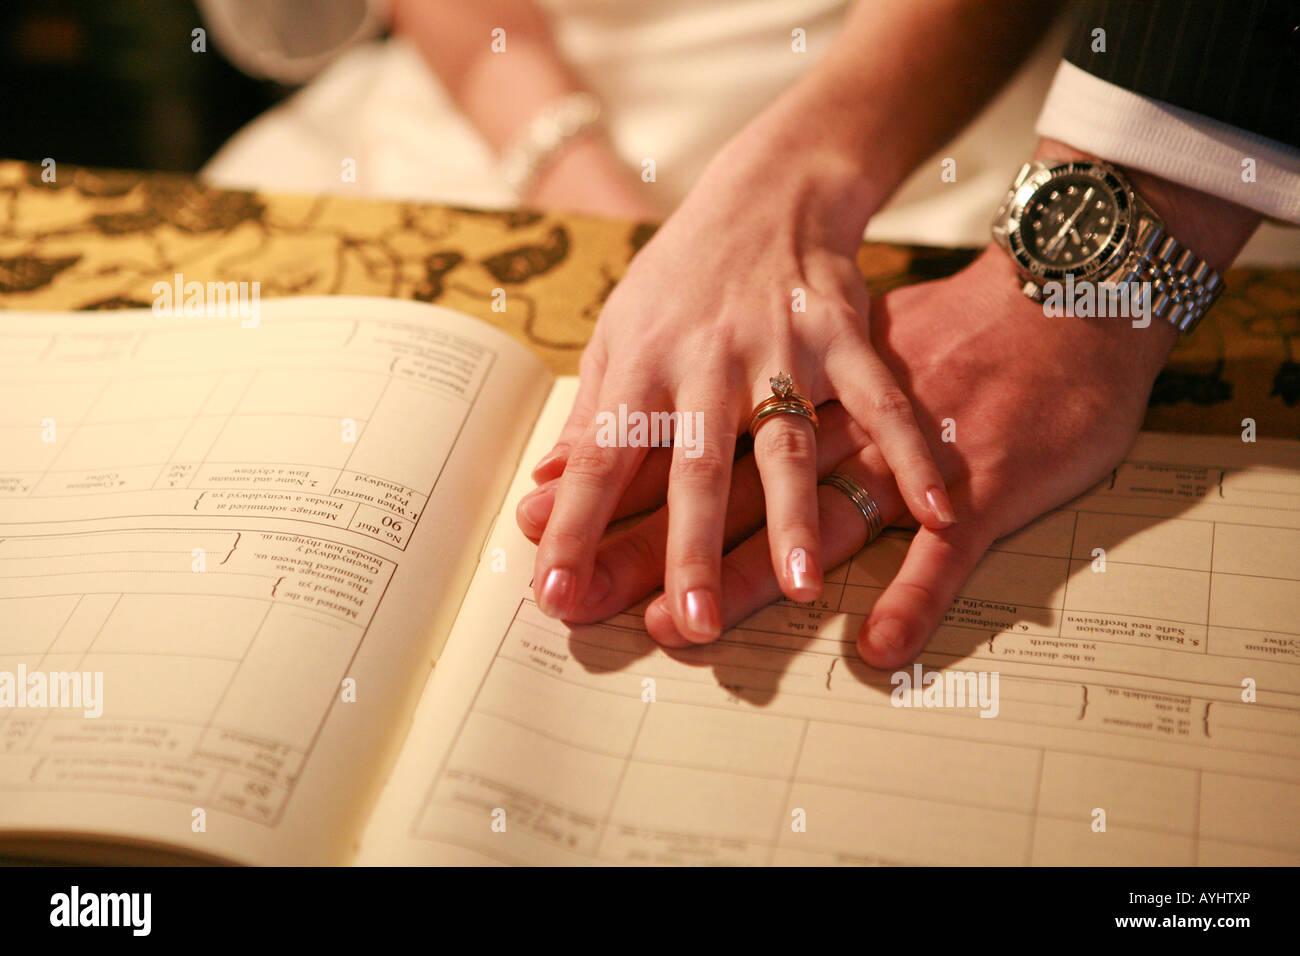 Register of marriage celebrants